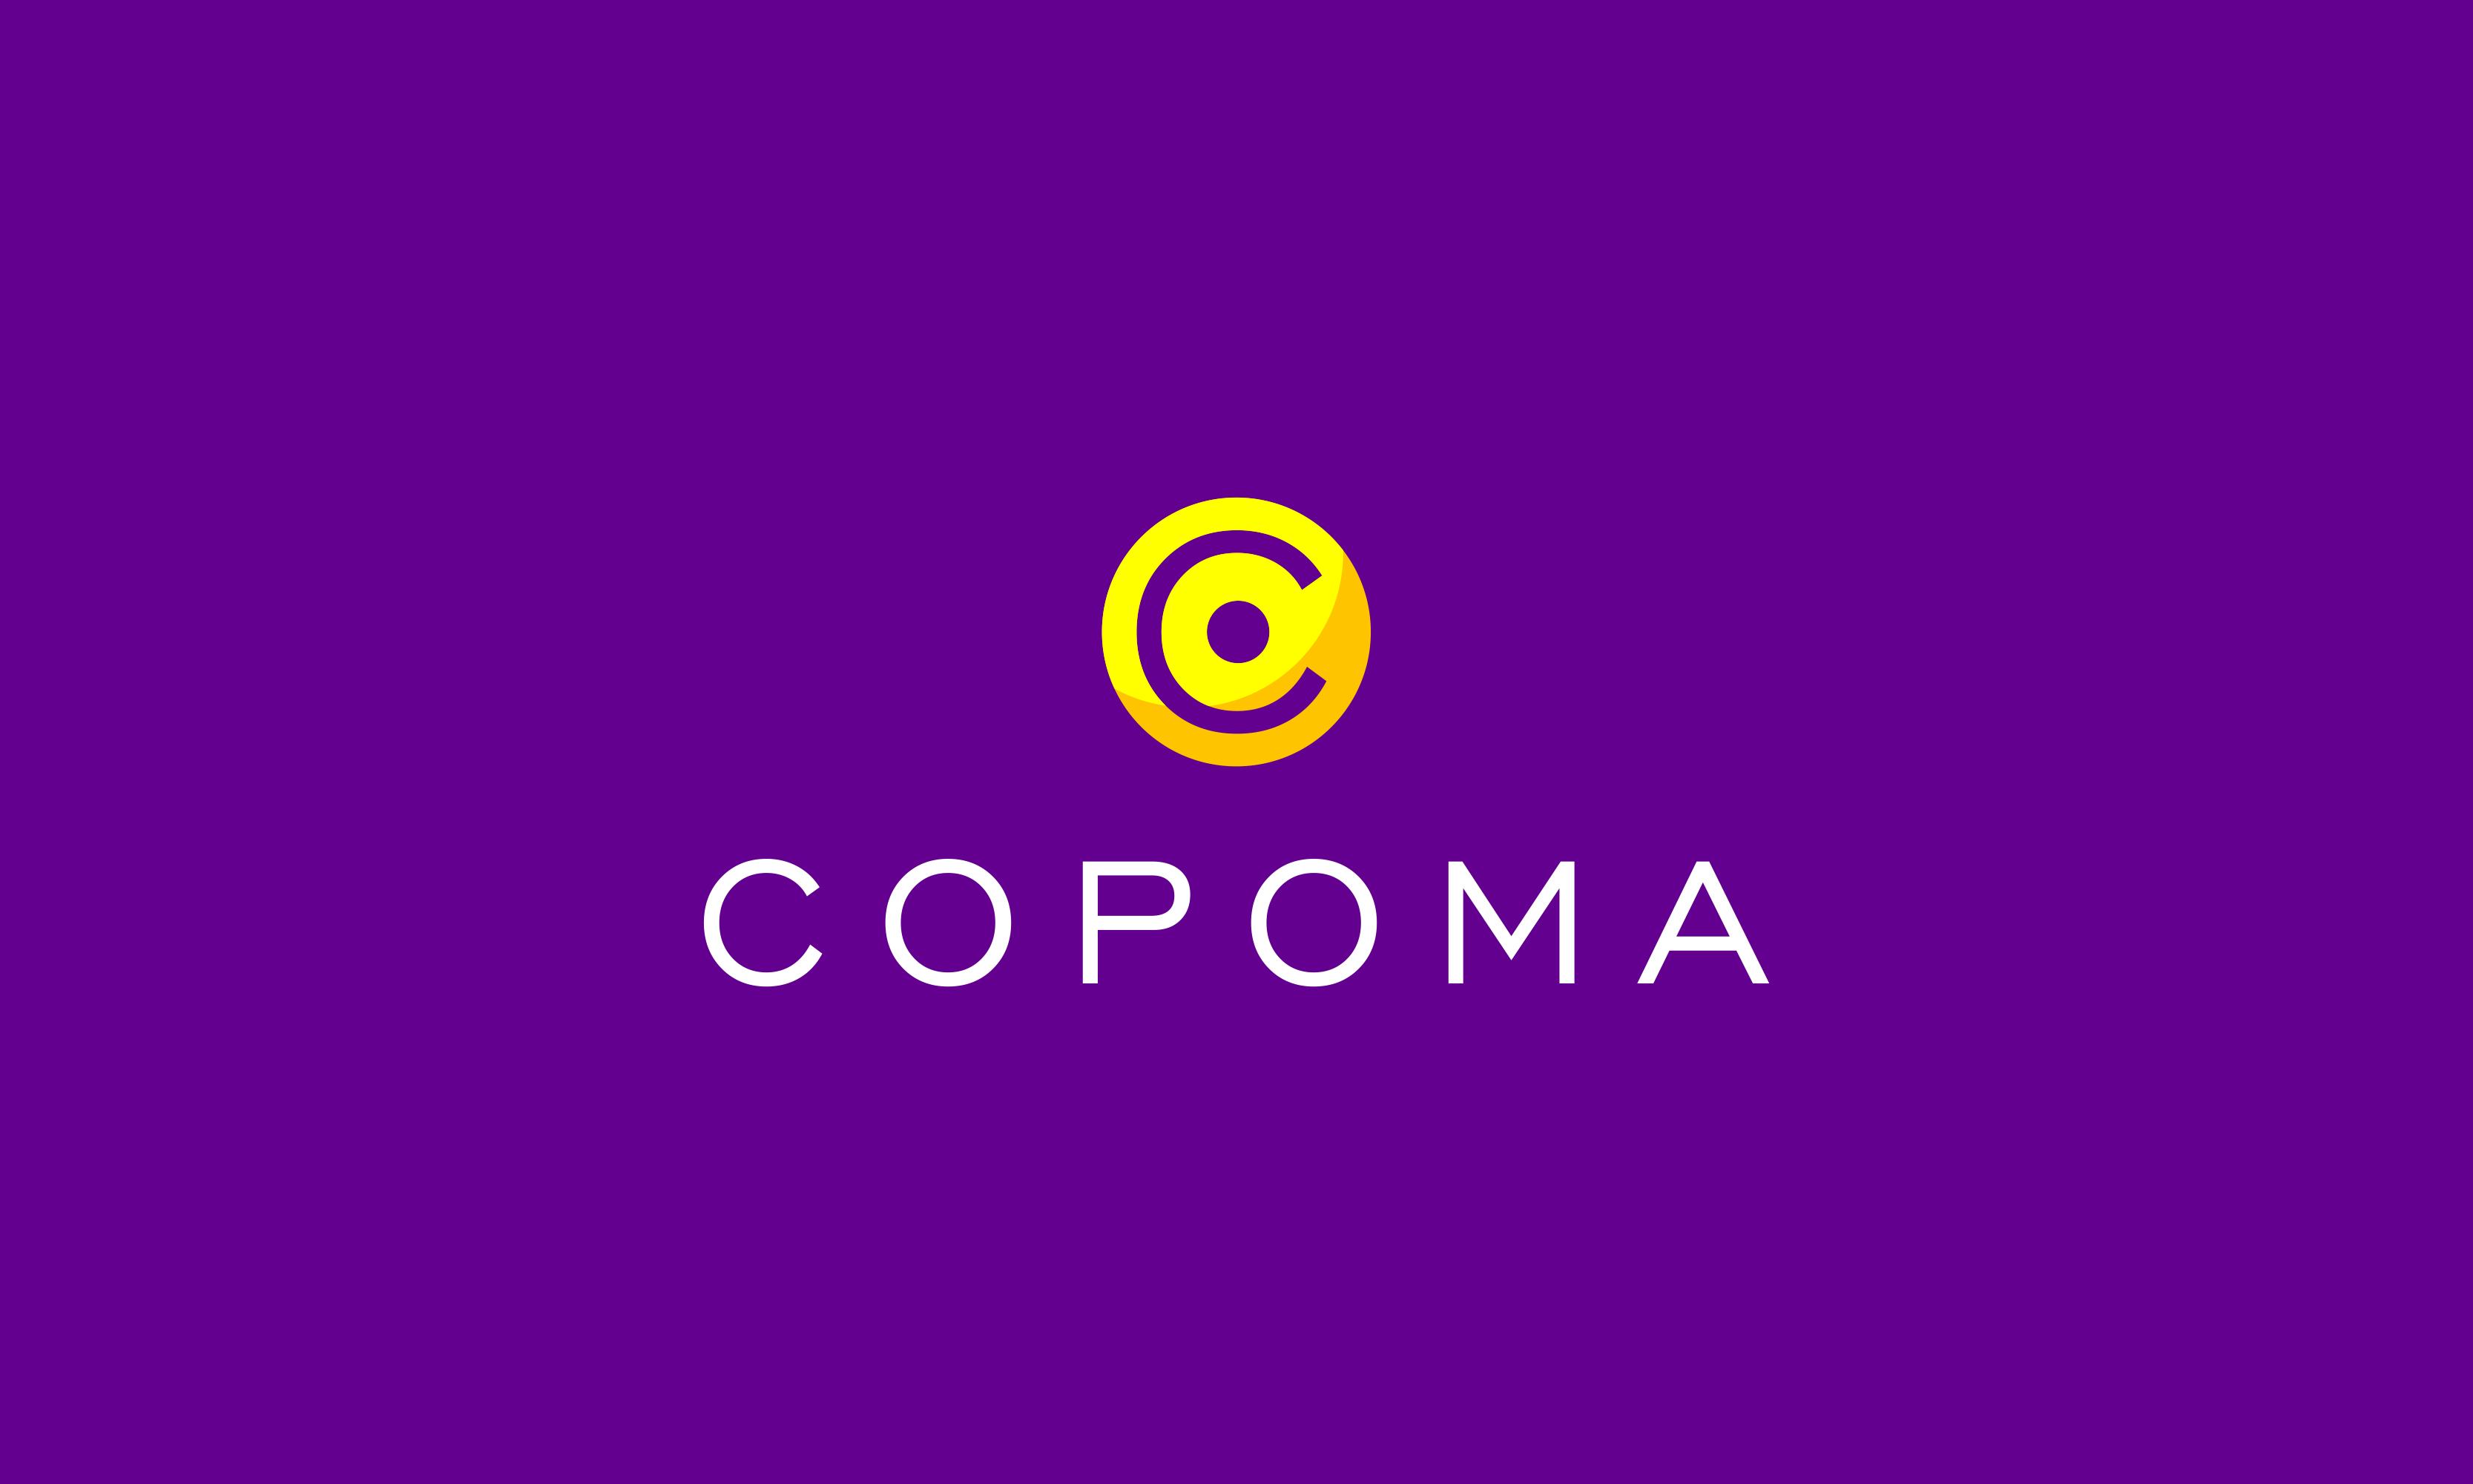 Copoma